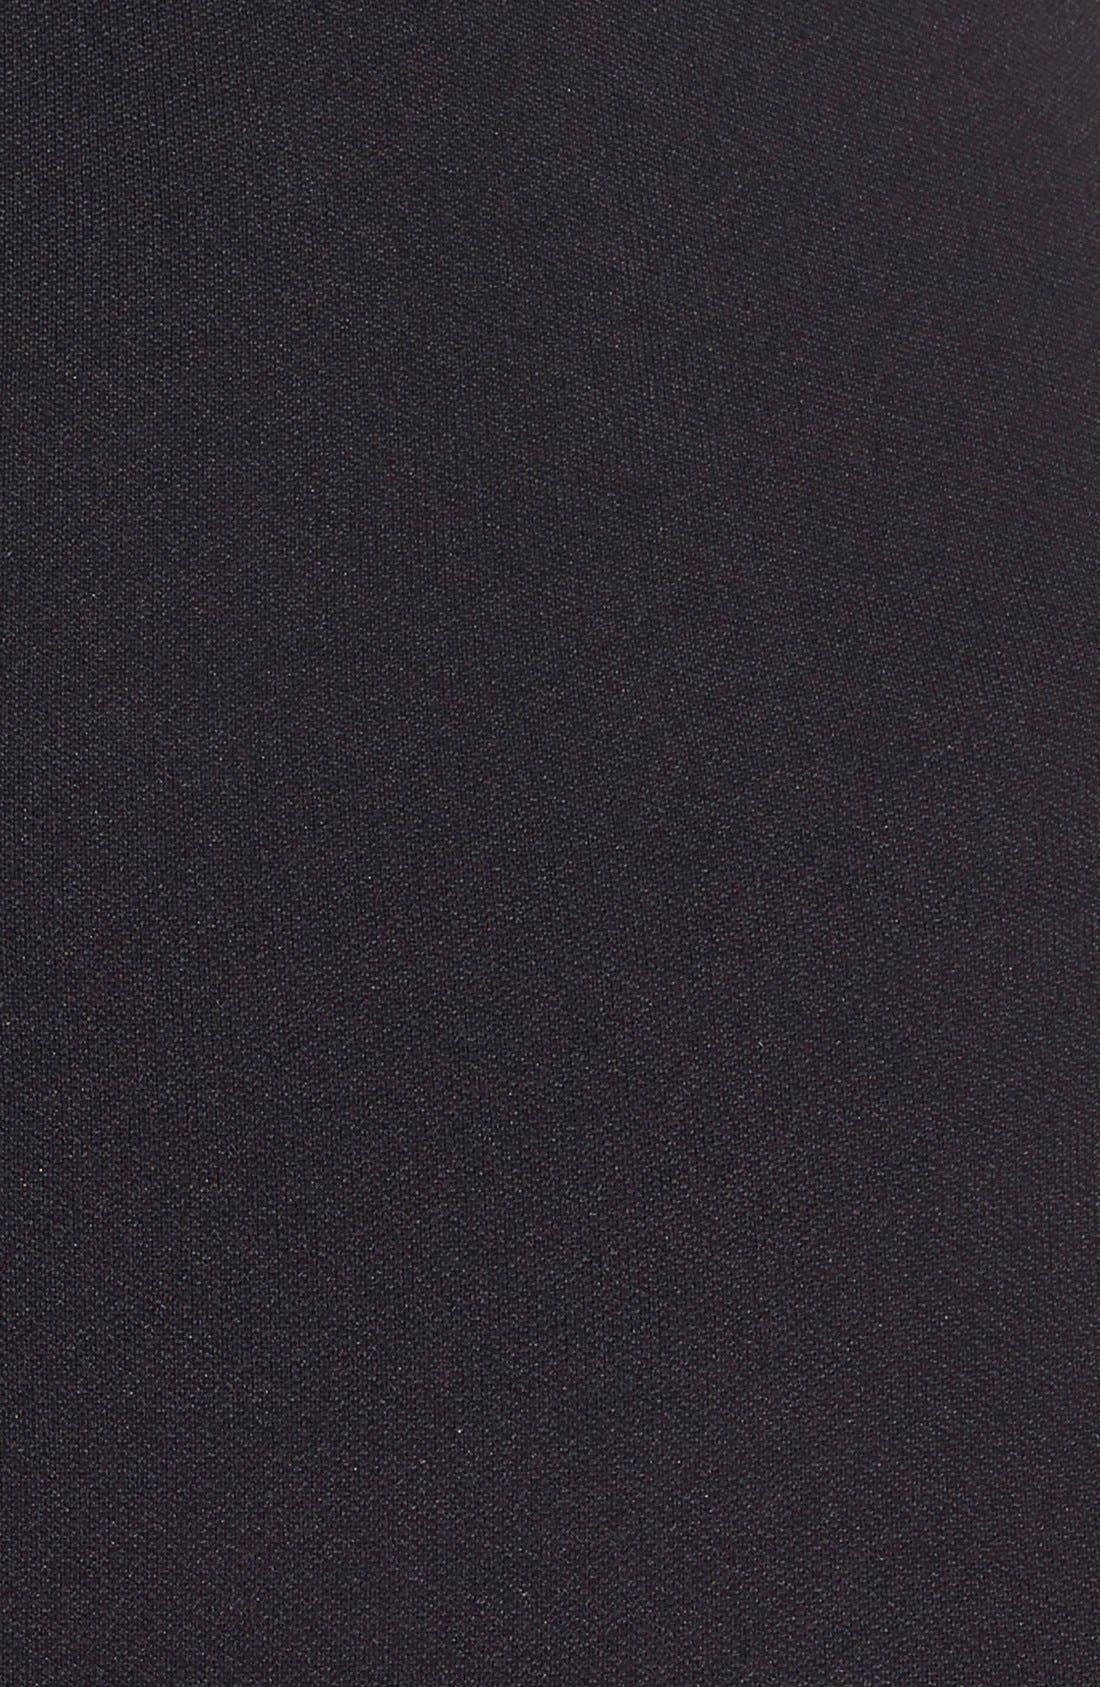 Shorty Shaping Shorts,                             Alternate thumbnail 3, color,                             BLACK